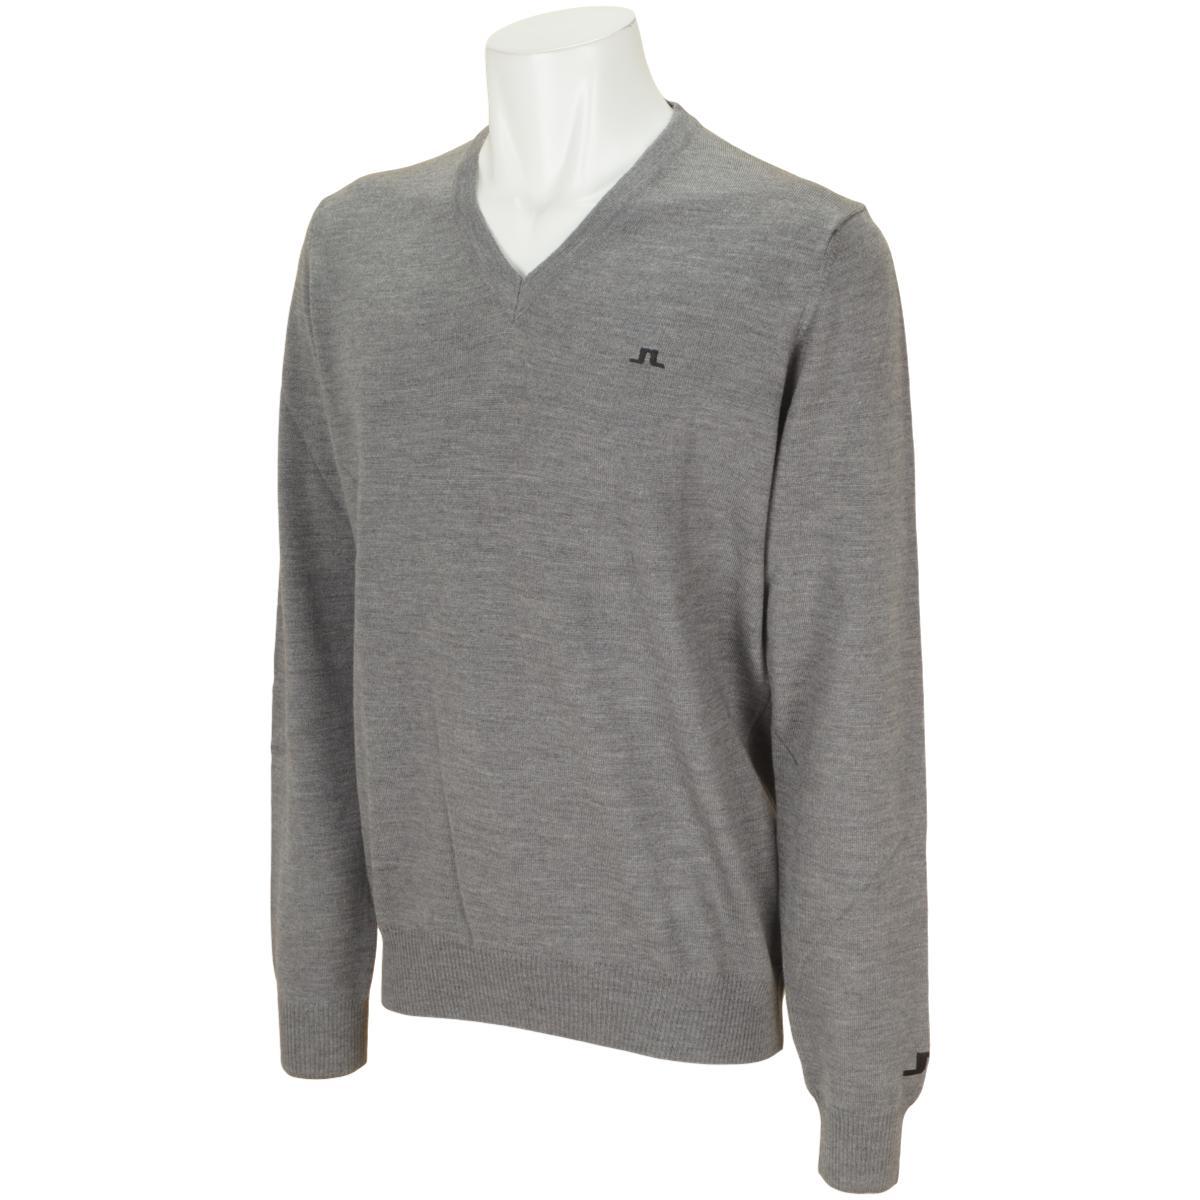 Lymann Tour Merino セーター